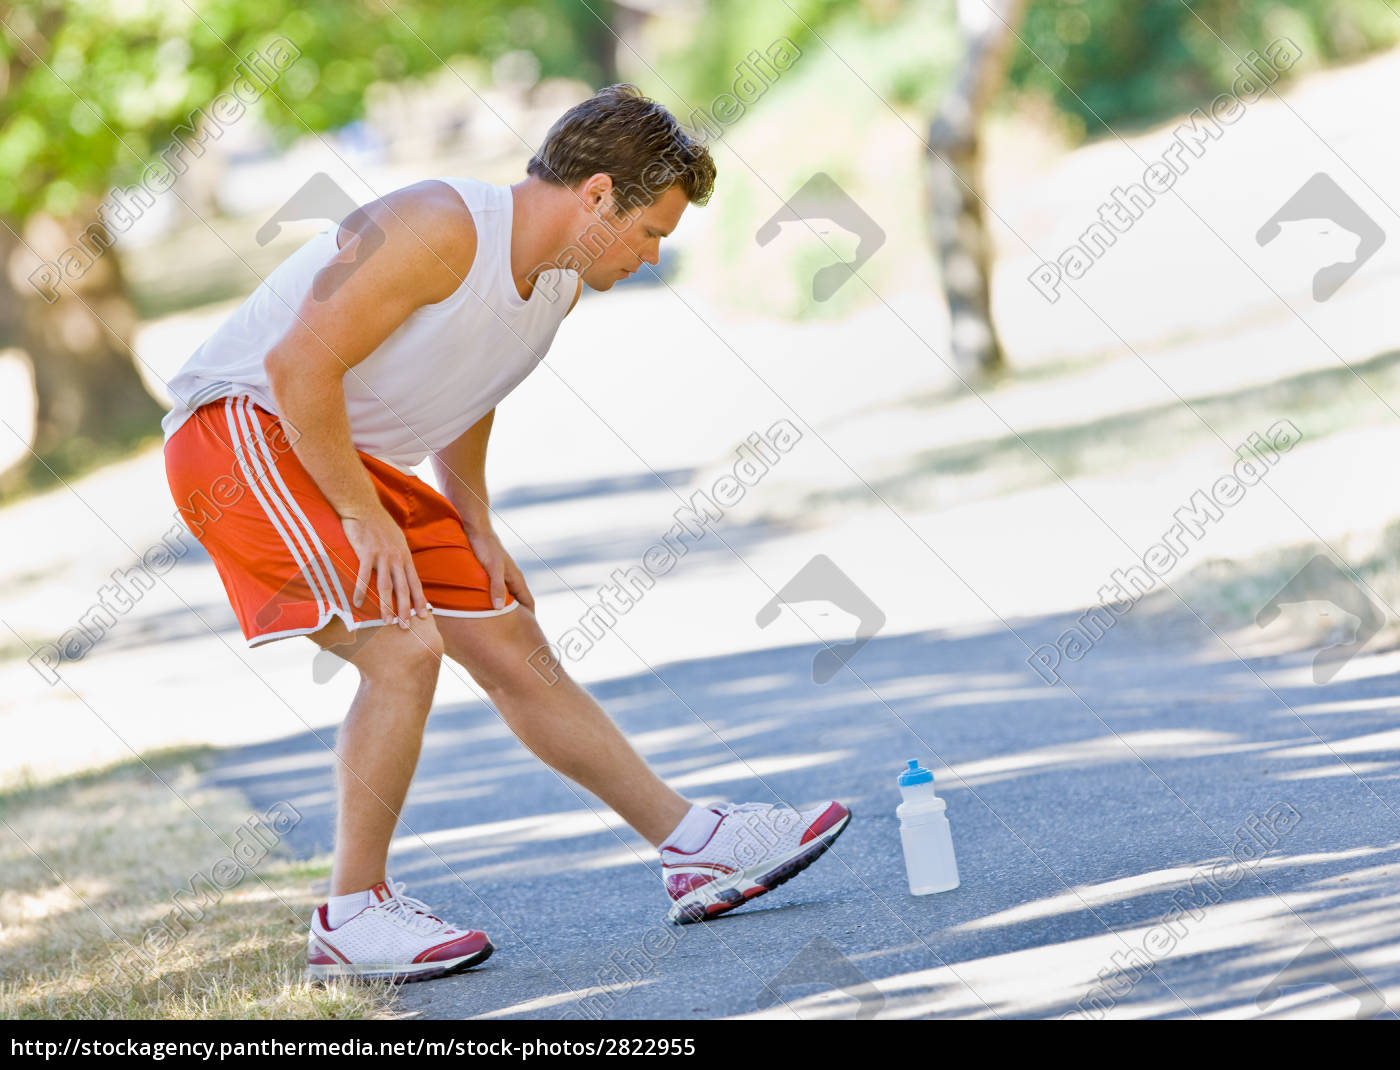 runner, stretching - 2822955